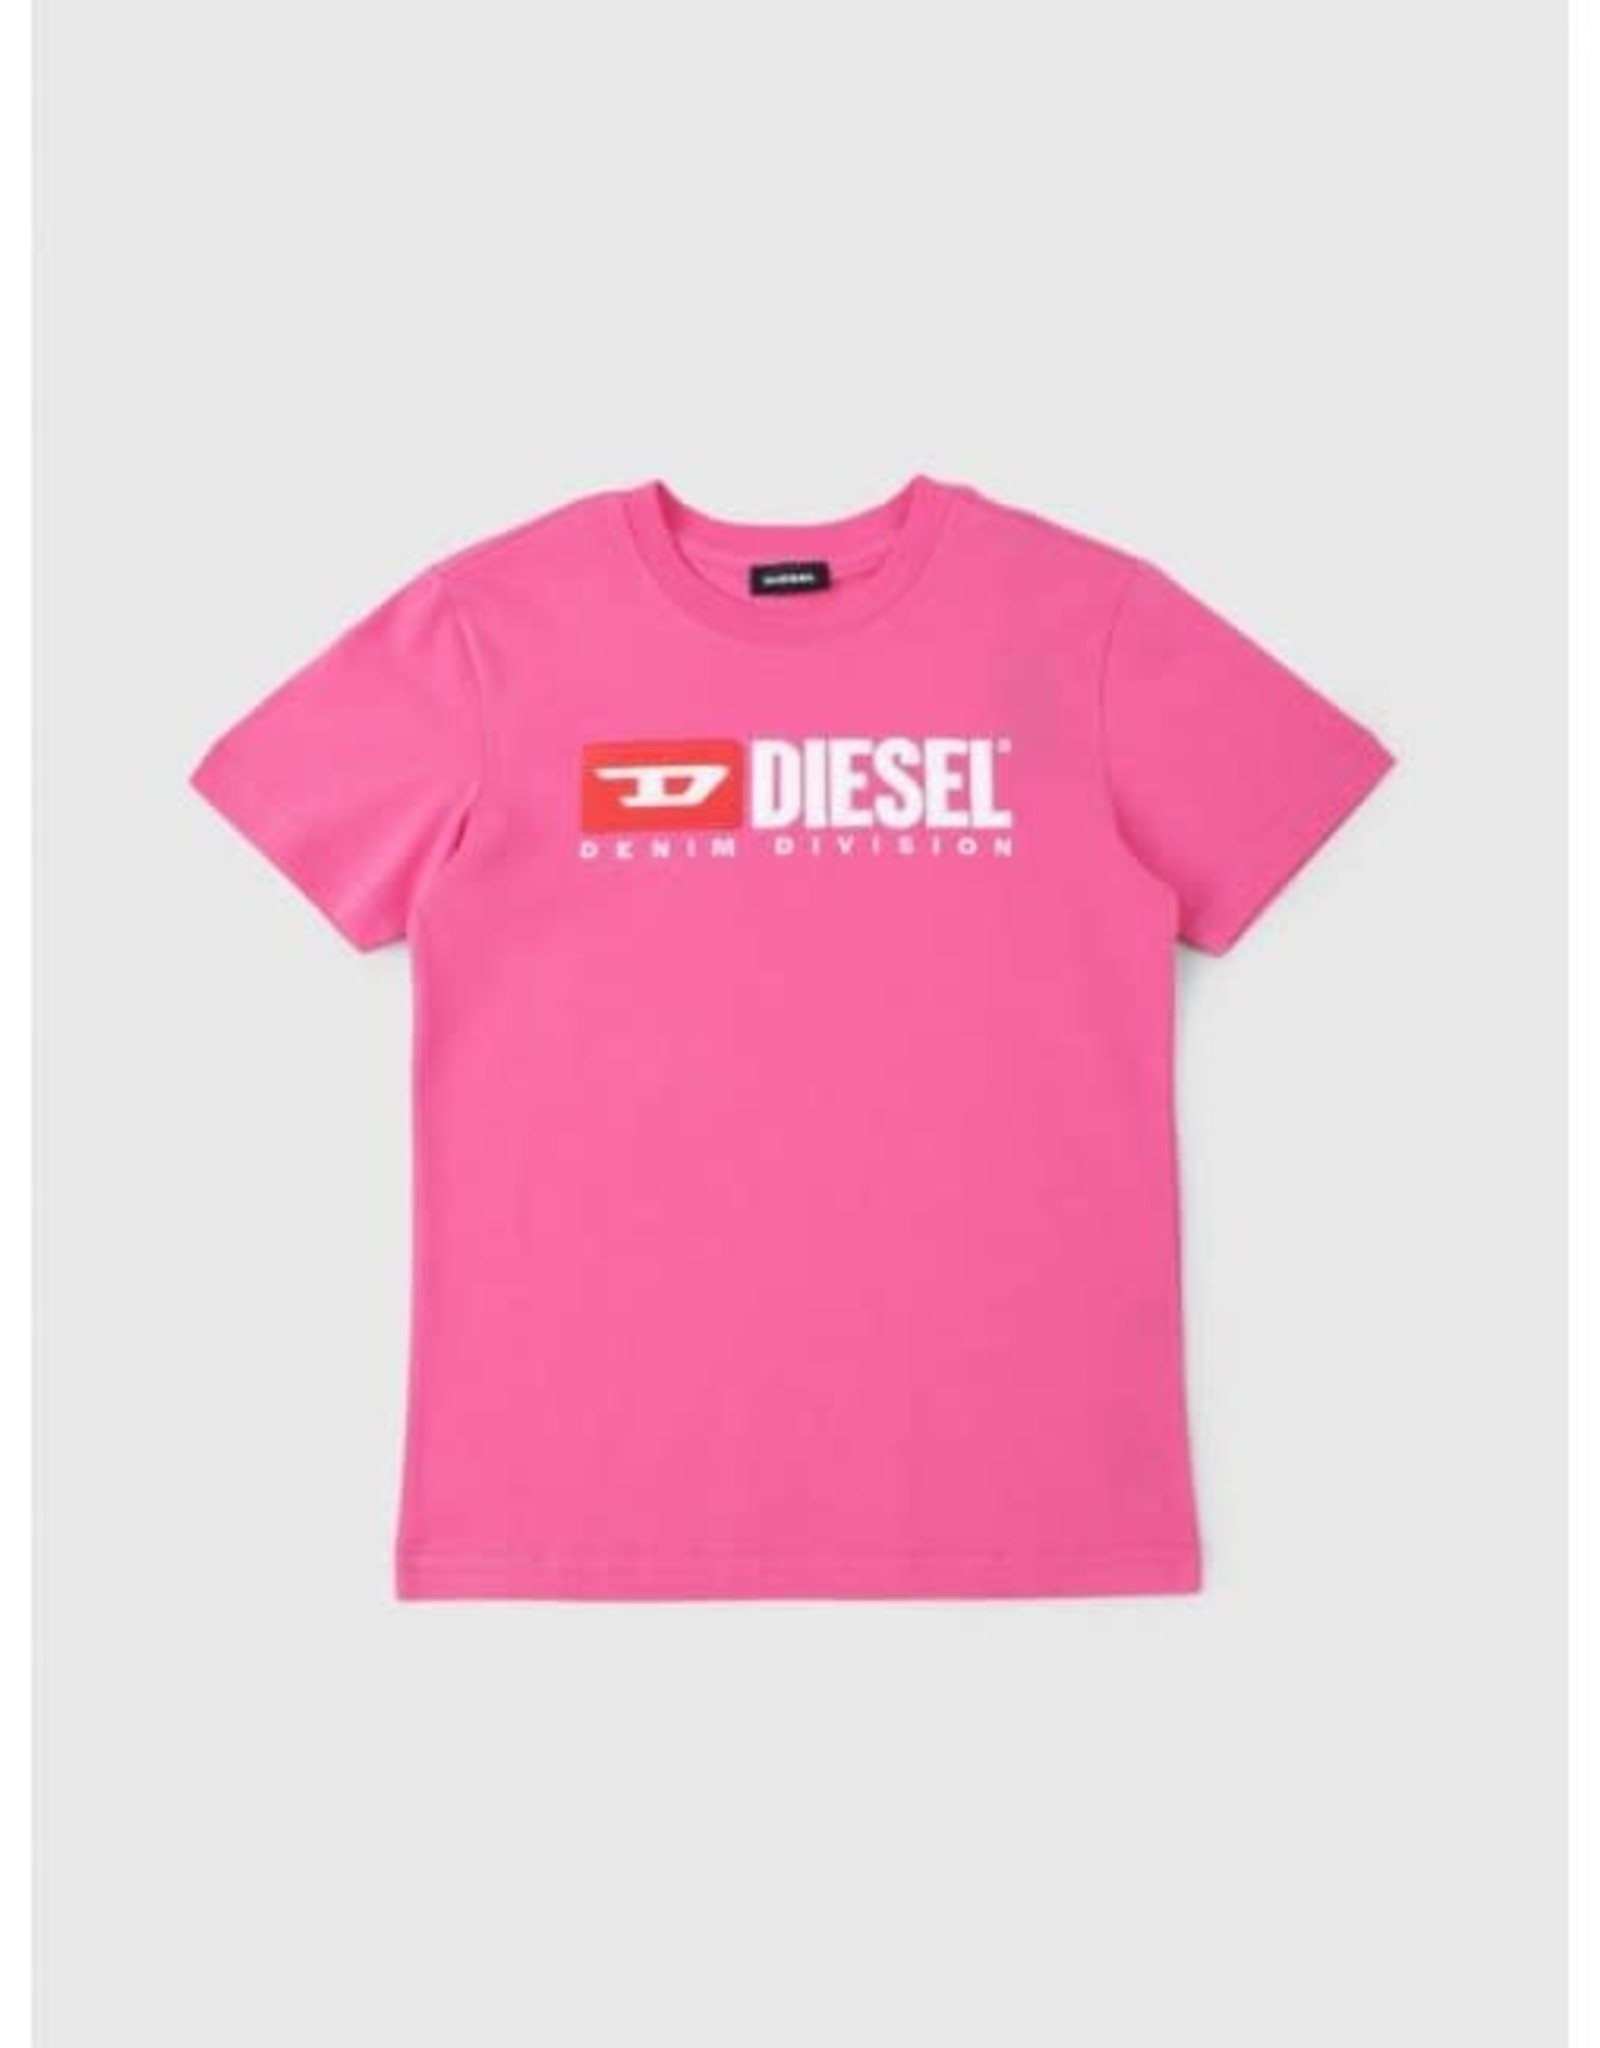 Diesel Tjustdivisionb